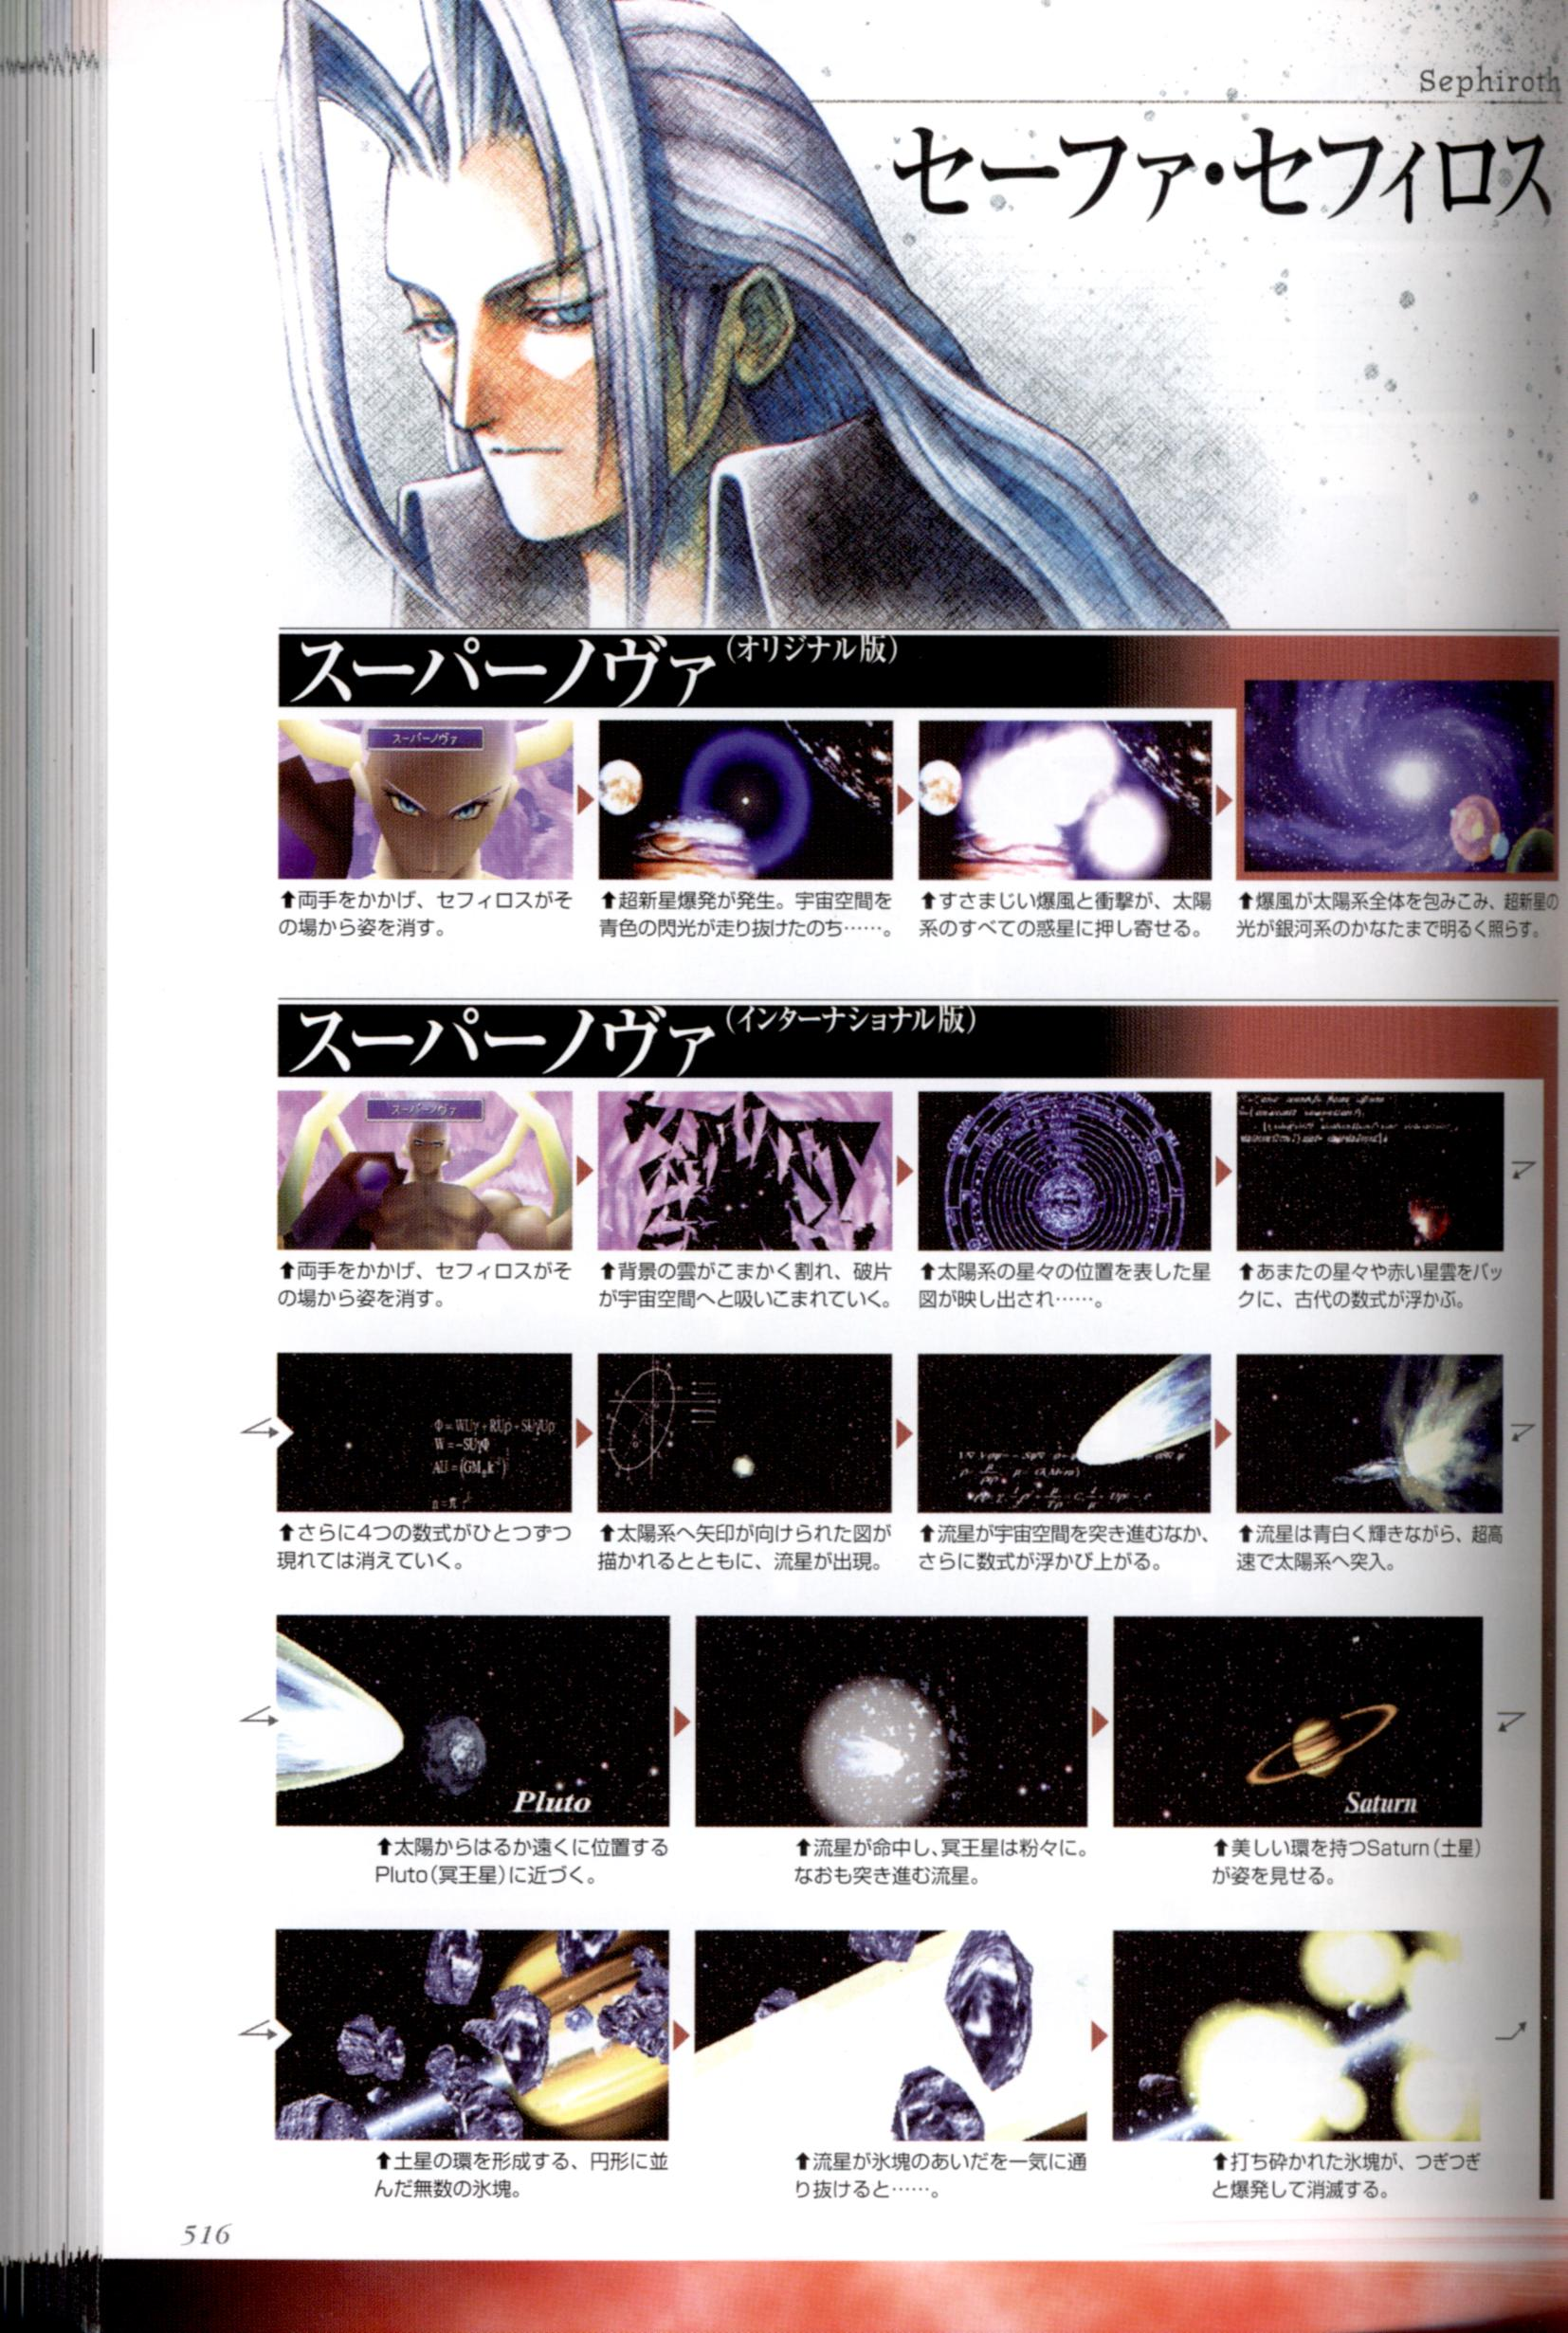 Image Final Fantasy VII Ultimania Omega 0516